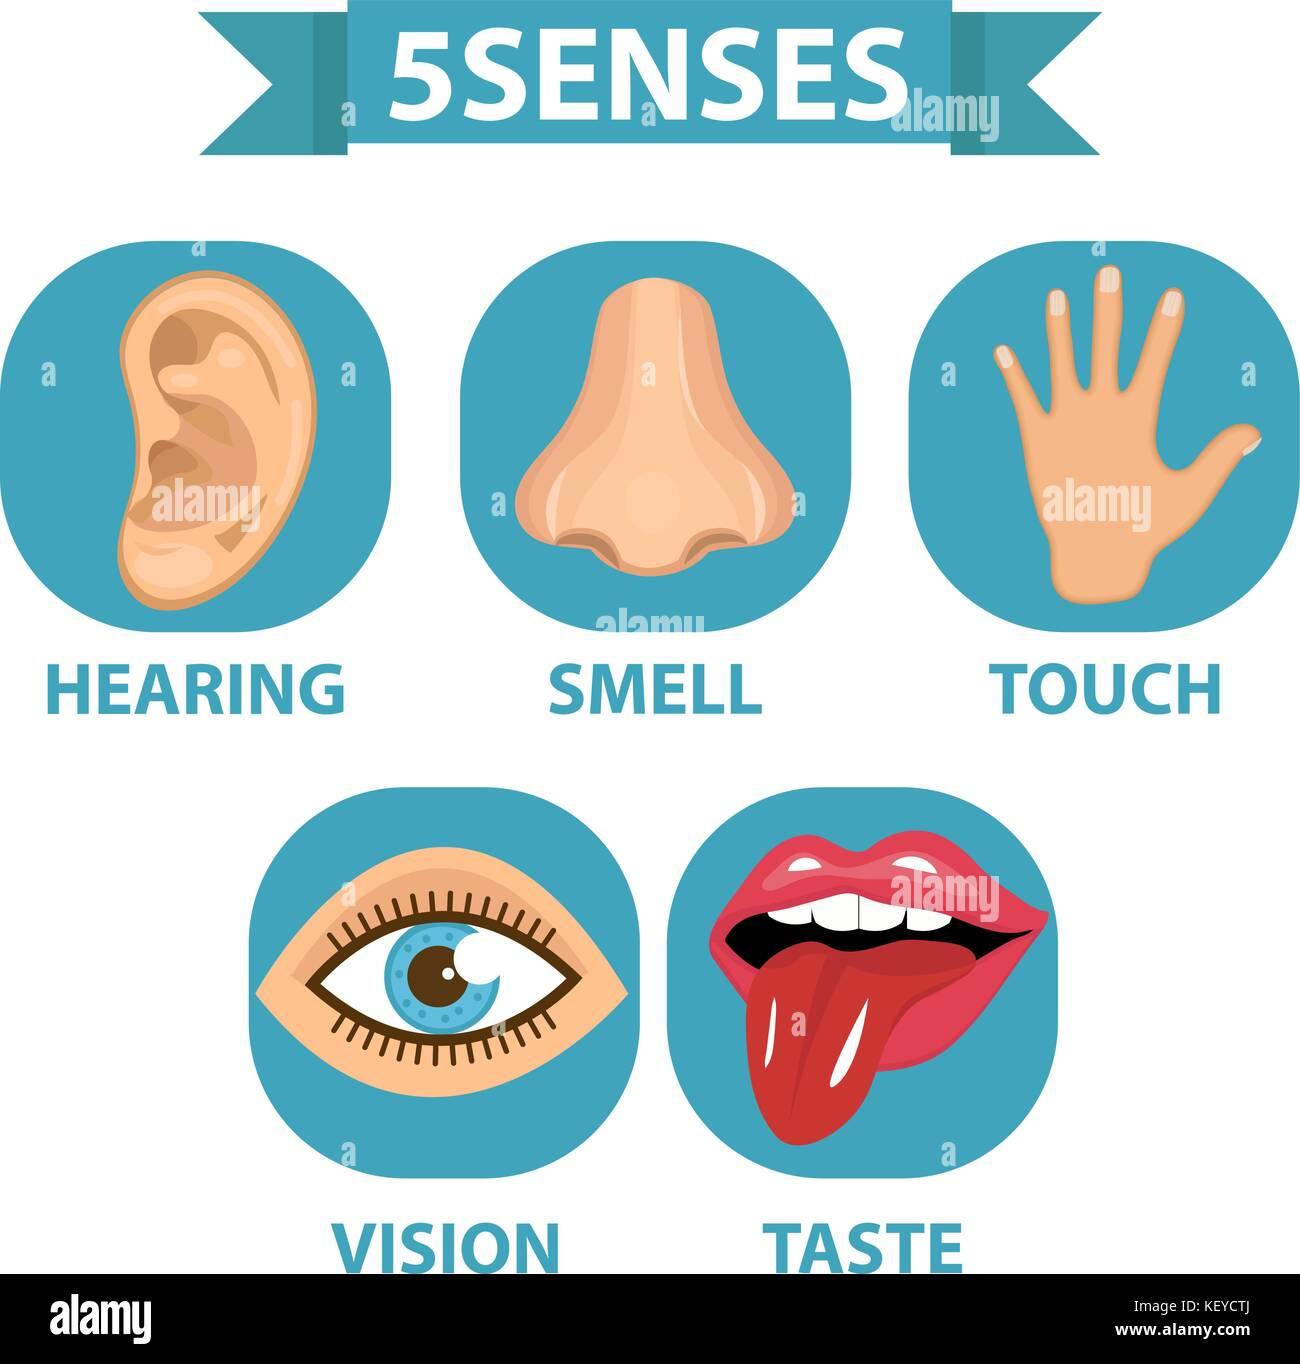 Five Senses Illustration High Resolution Stock Photography